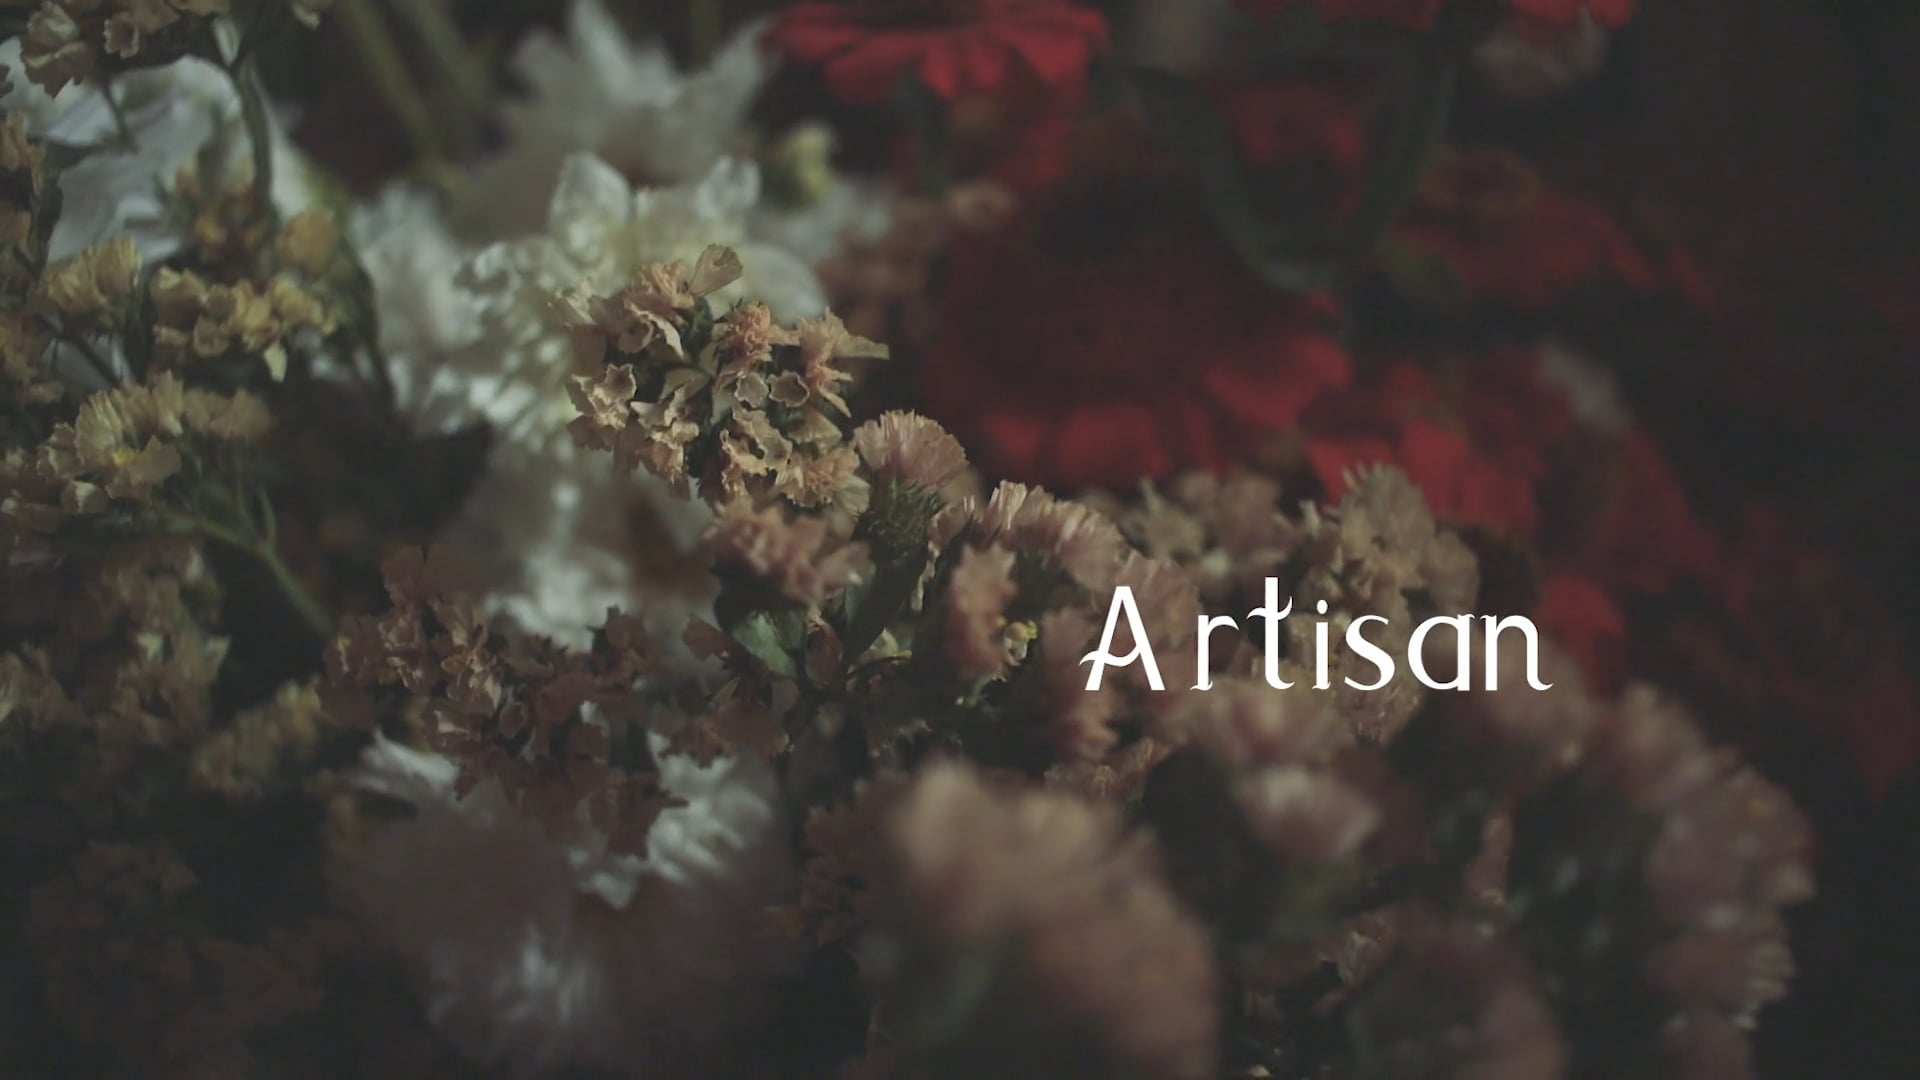 Artisan for Tree of Life